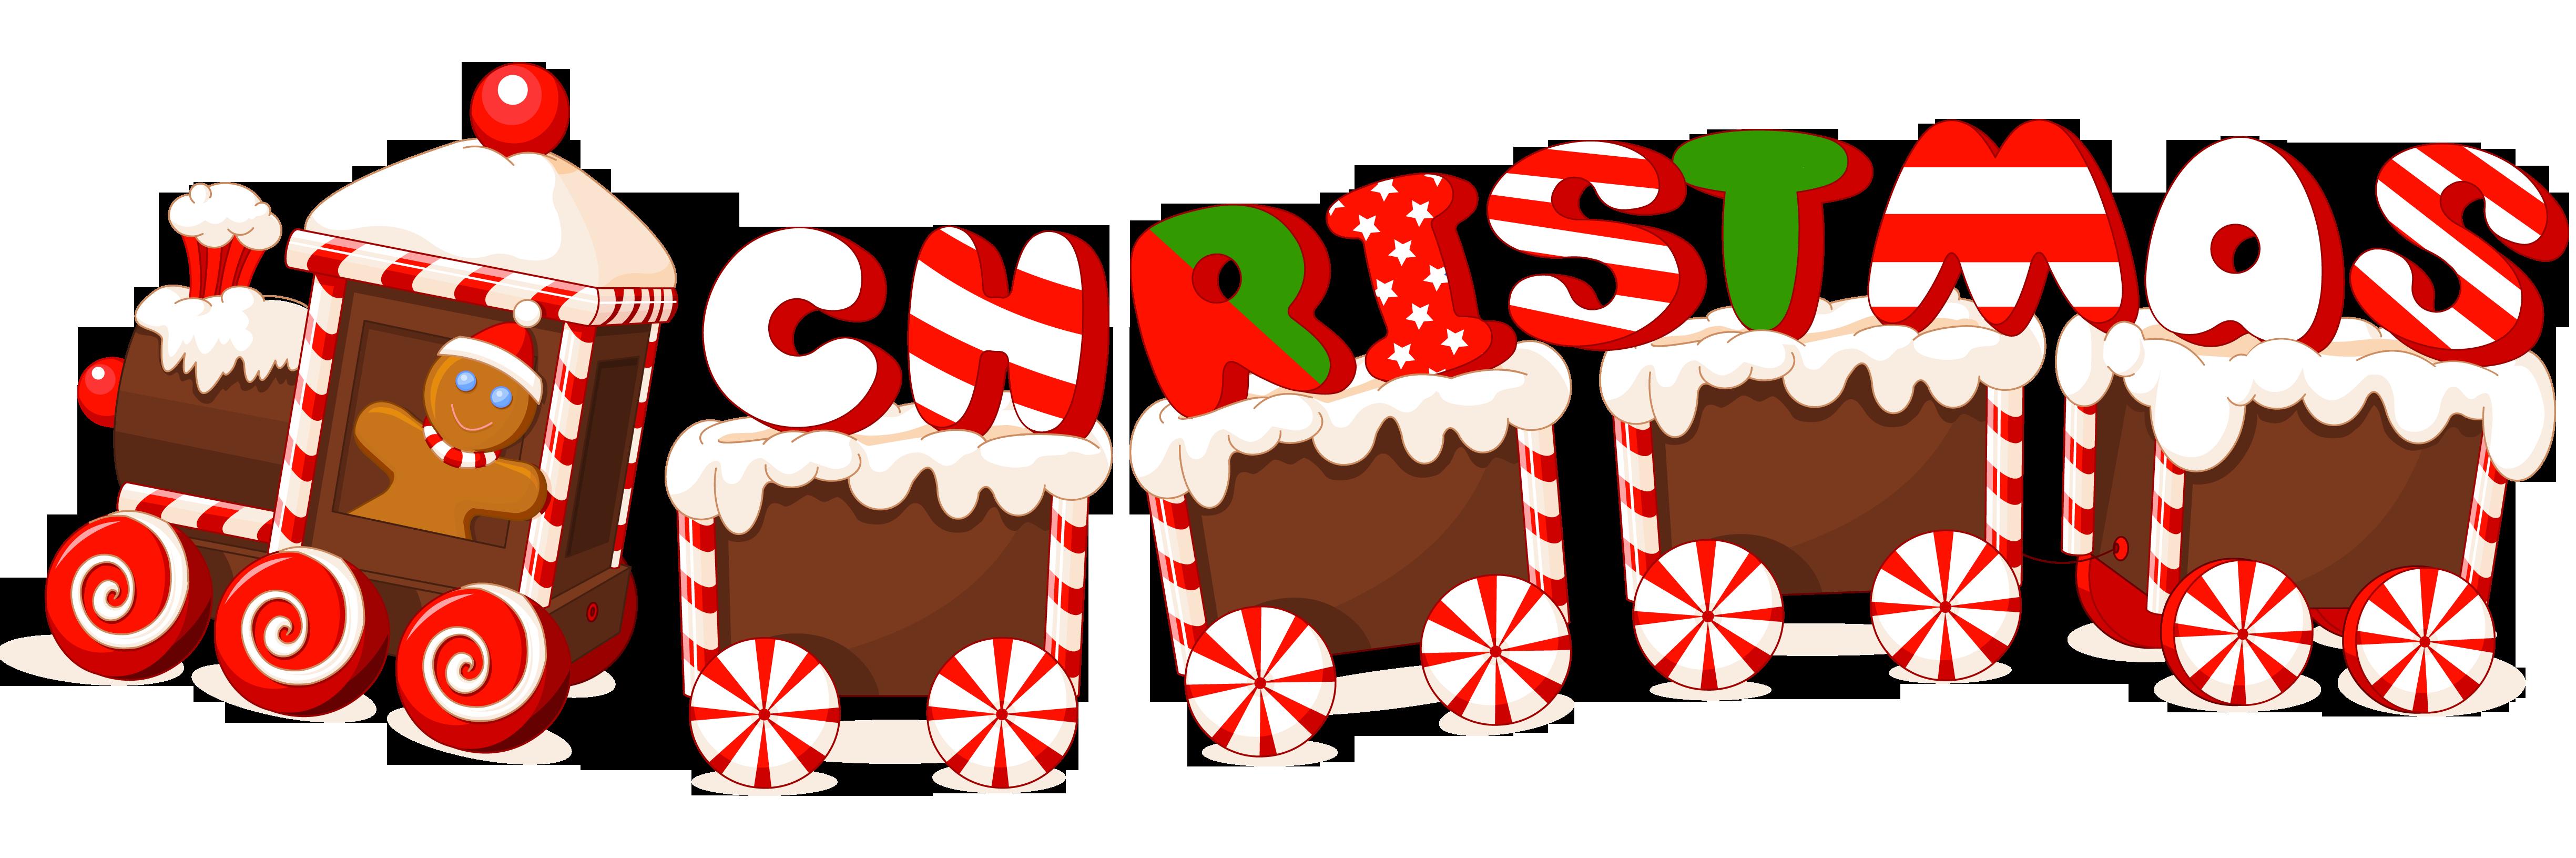 16 Merry Christmas Clipart-16 Merry Christmas Clipart-0